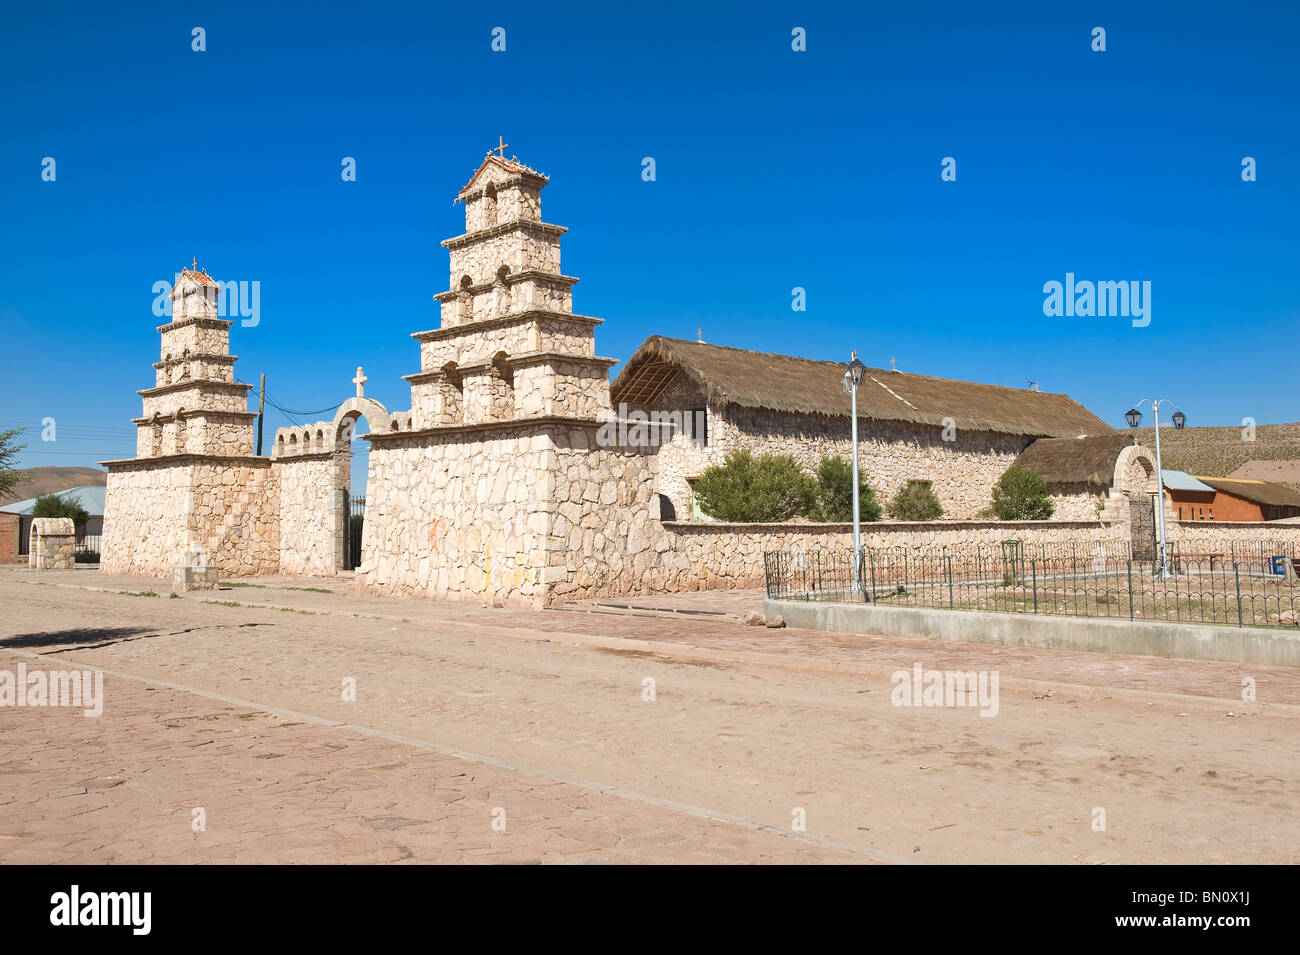 17th century church, San Cristobal, Altiplano, Potosi, Bolivia - Stock Image